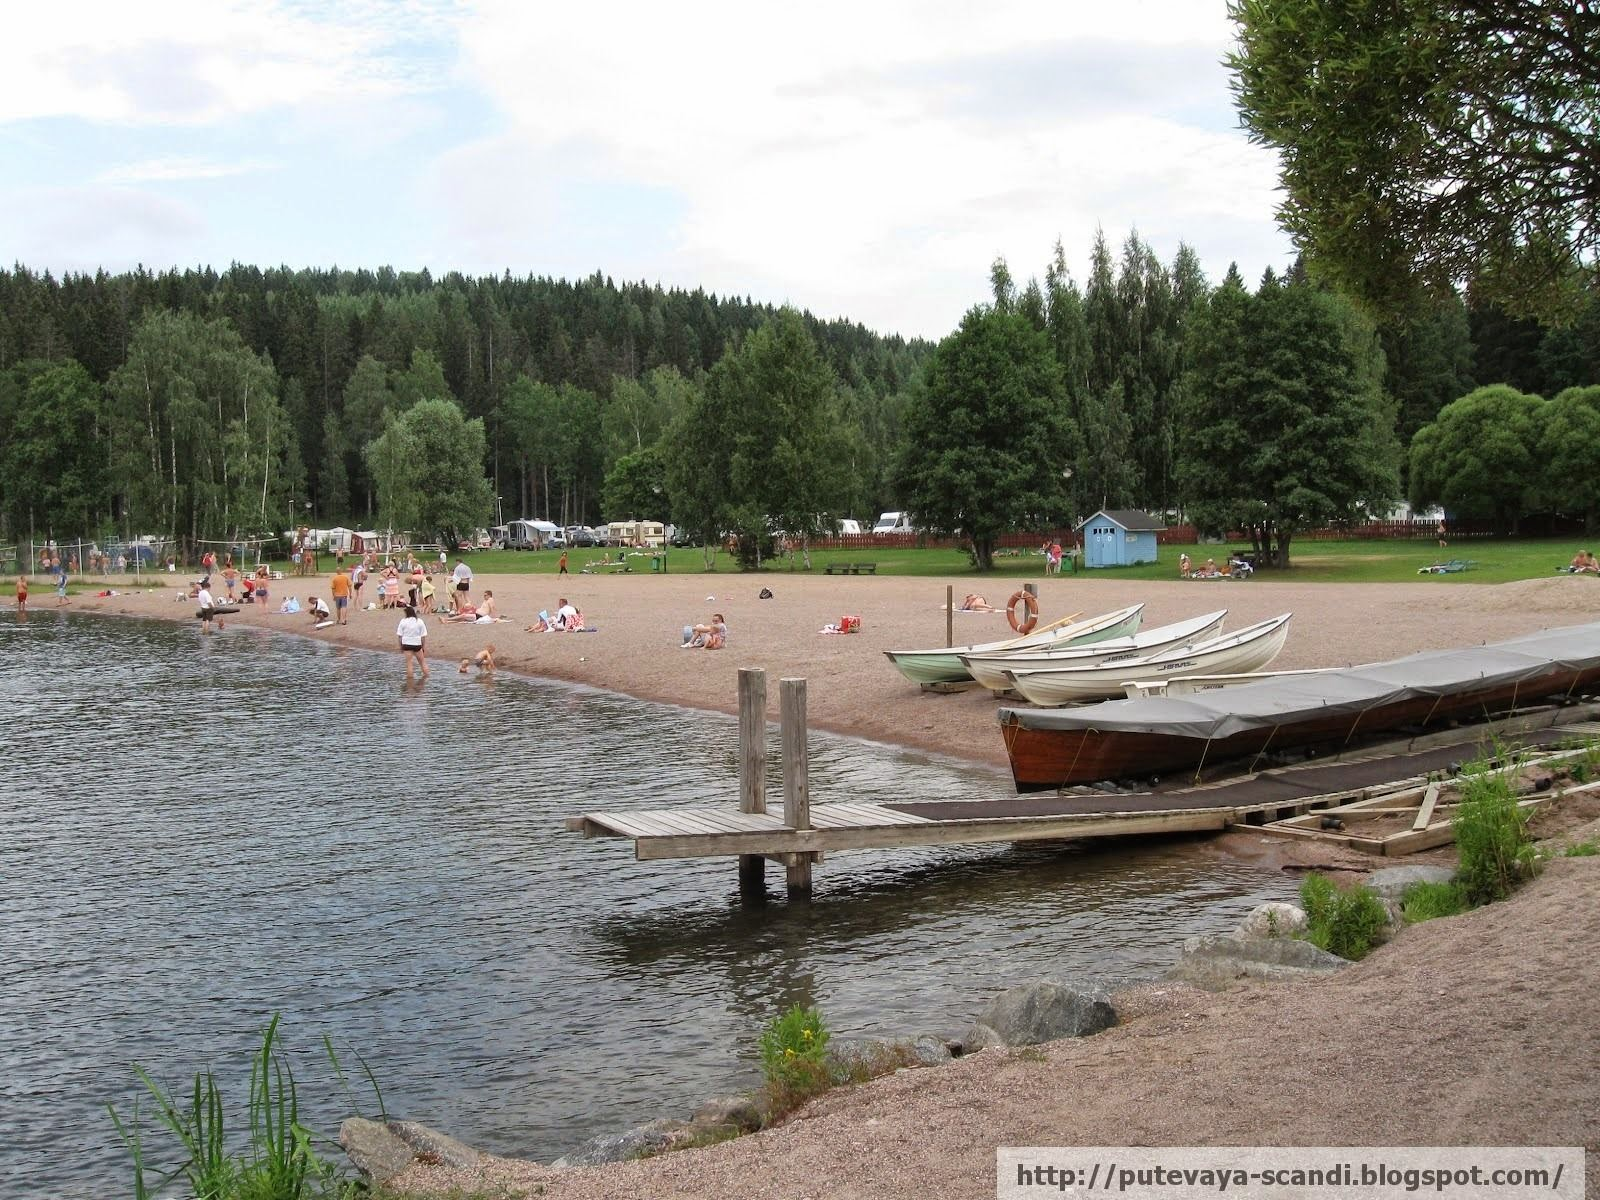 Sunbathes in Finnish style